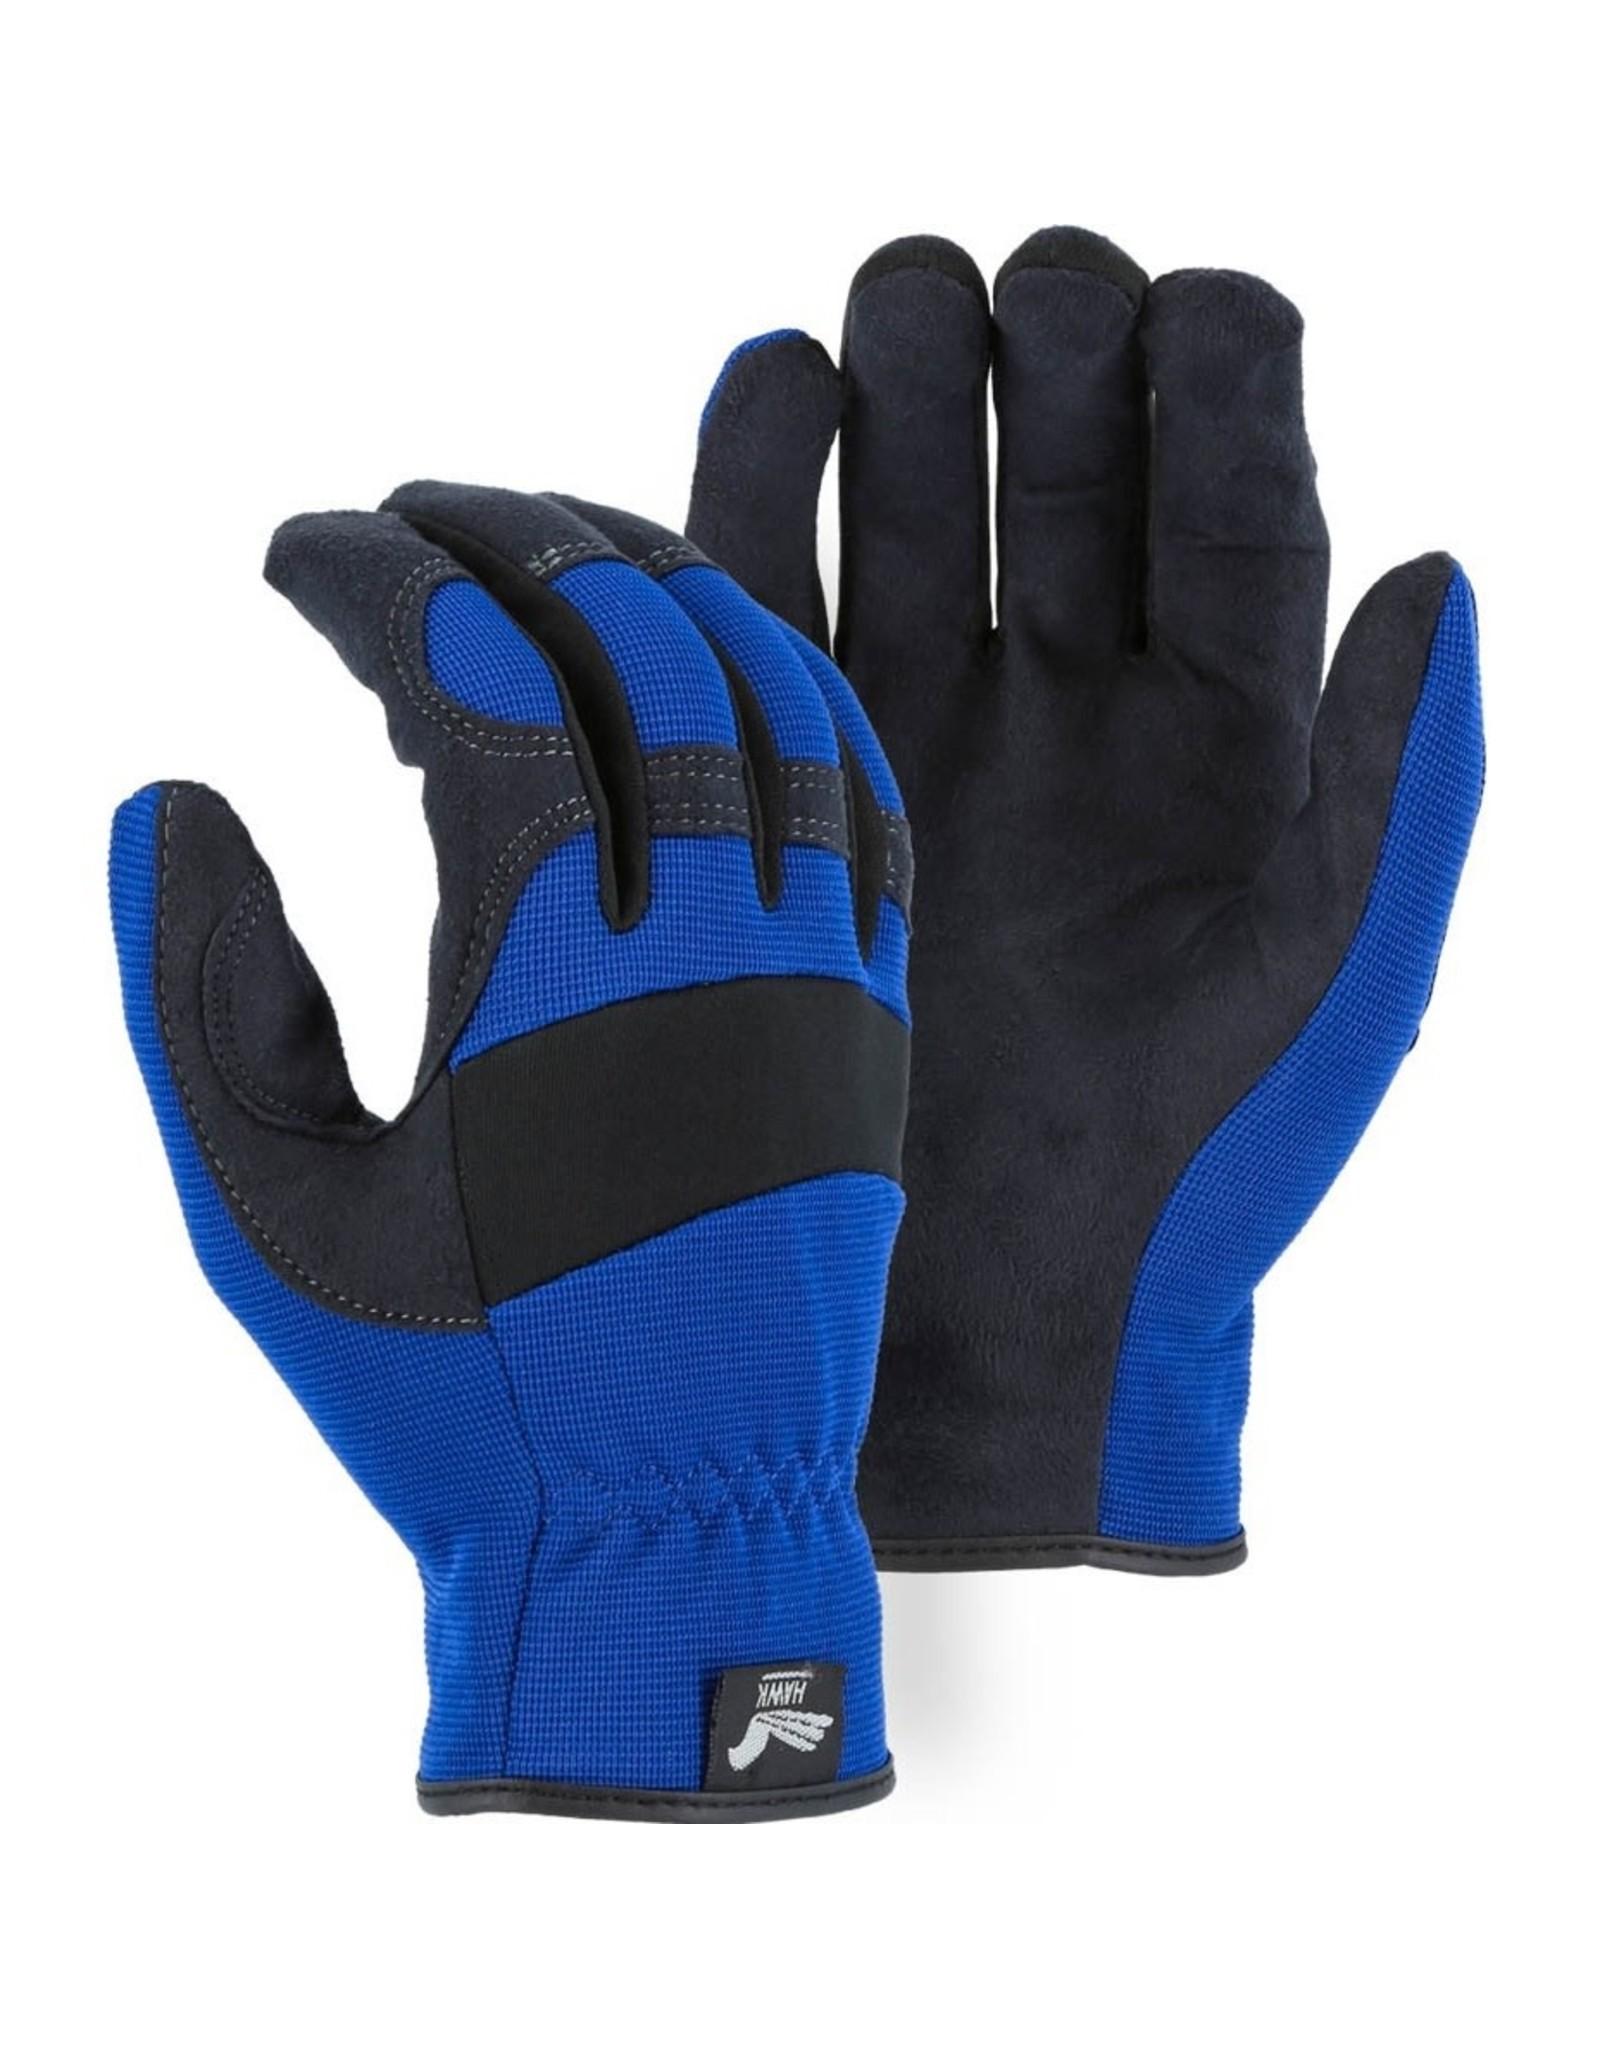 Majestic Glove Armor Skin™ Mechanics Glove with Knit Back